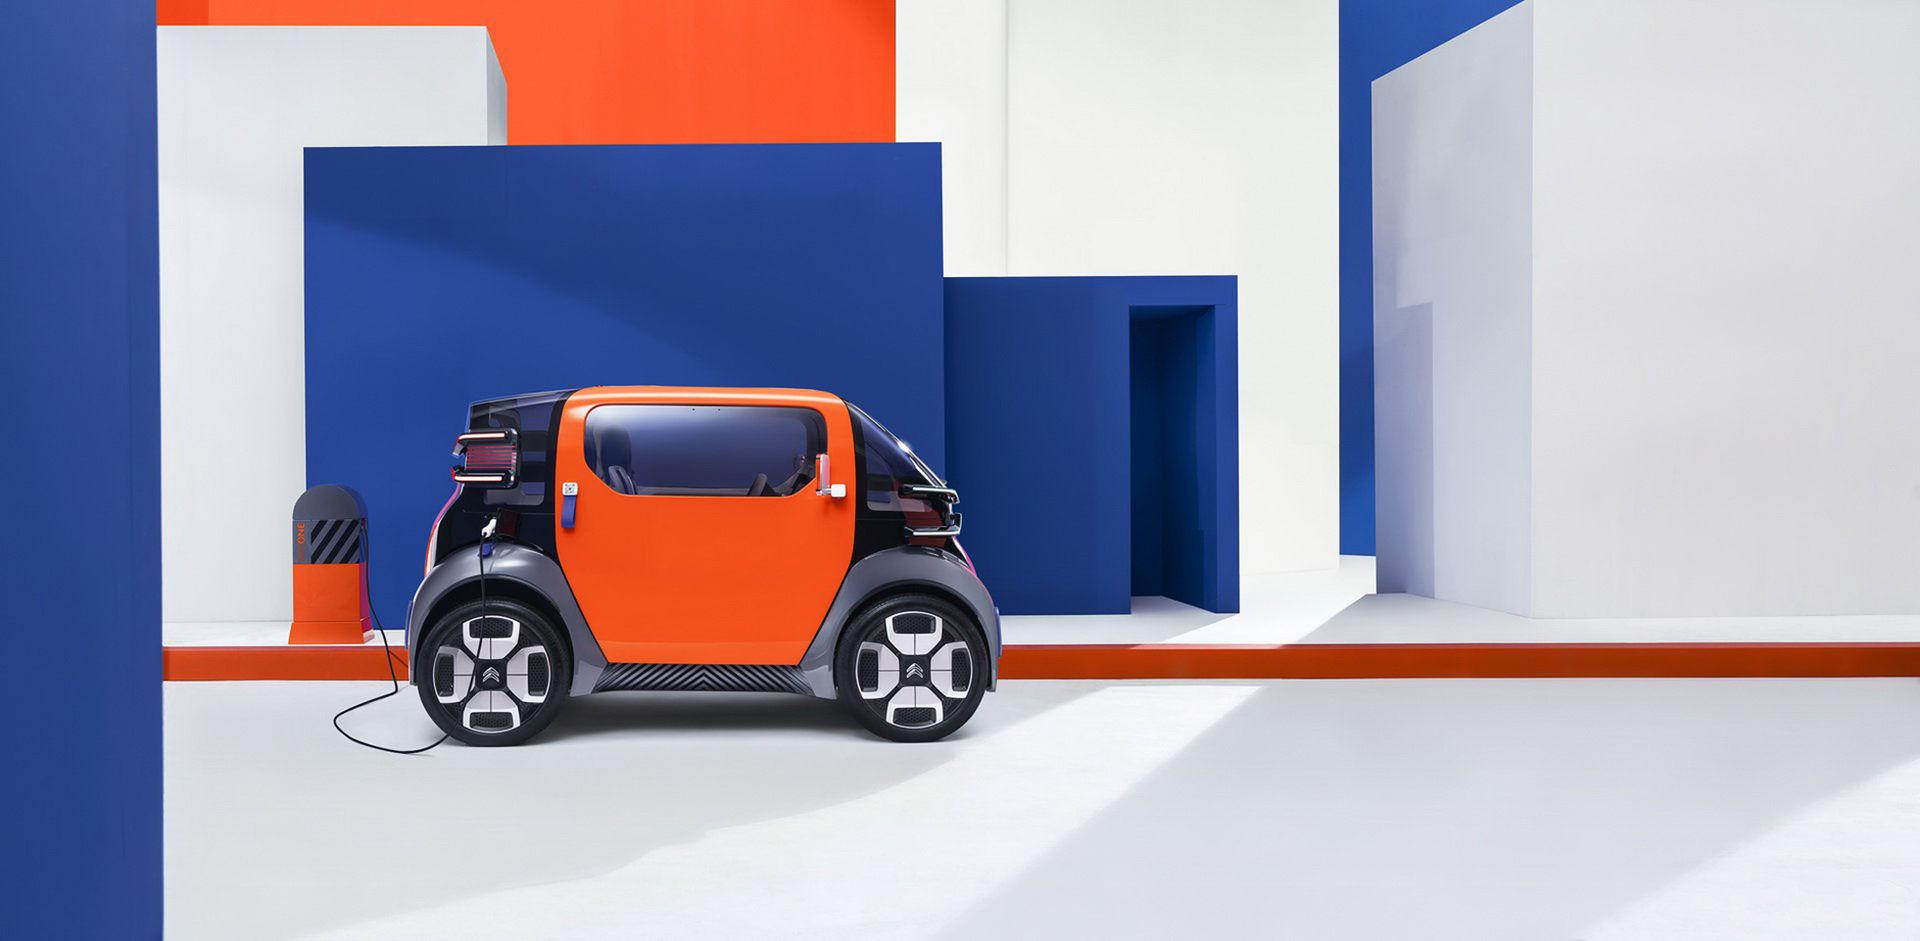 Ami One - eldrivet koncept från Citroën som toppar 45 km/h